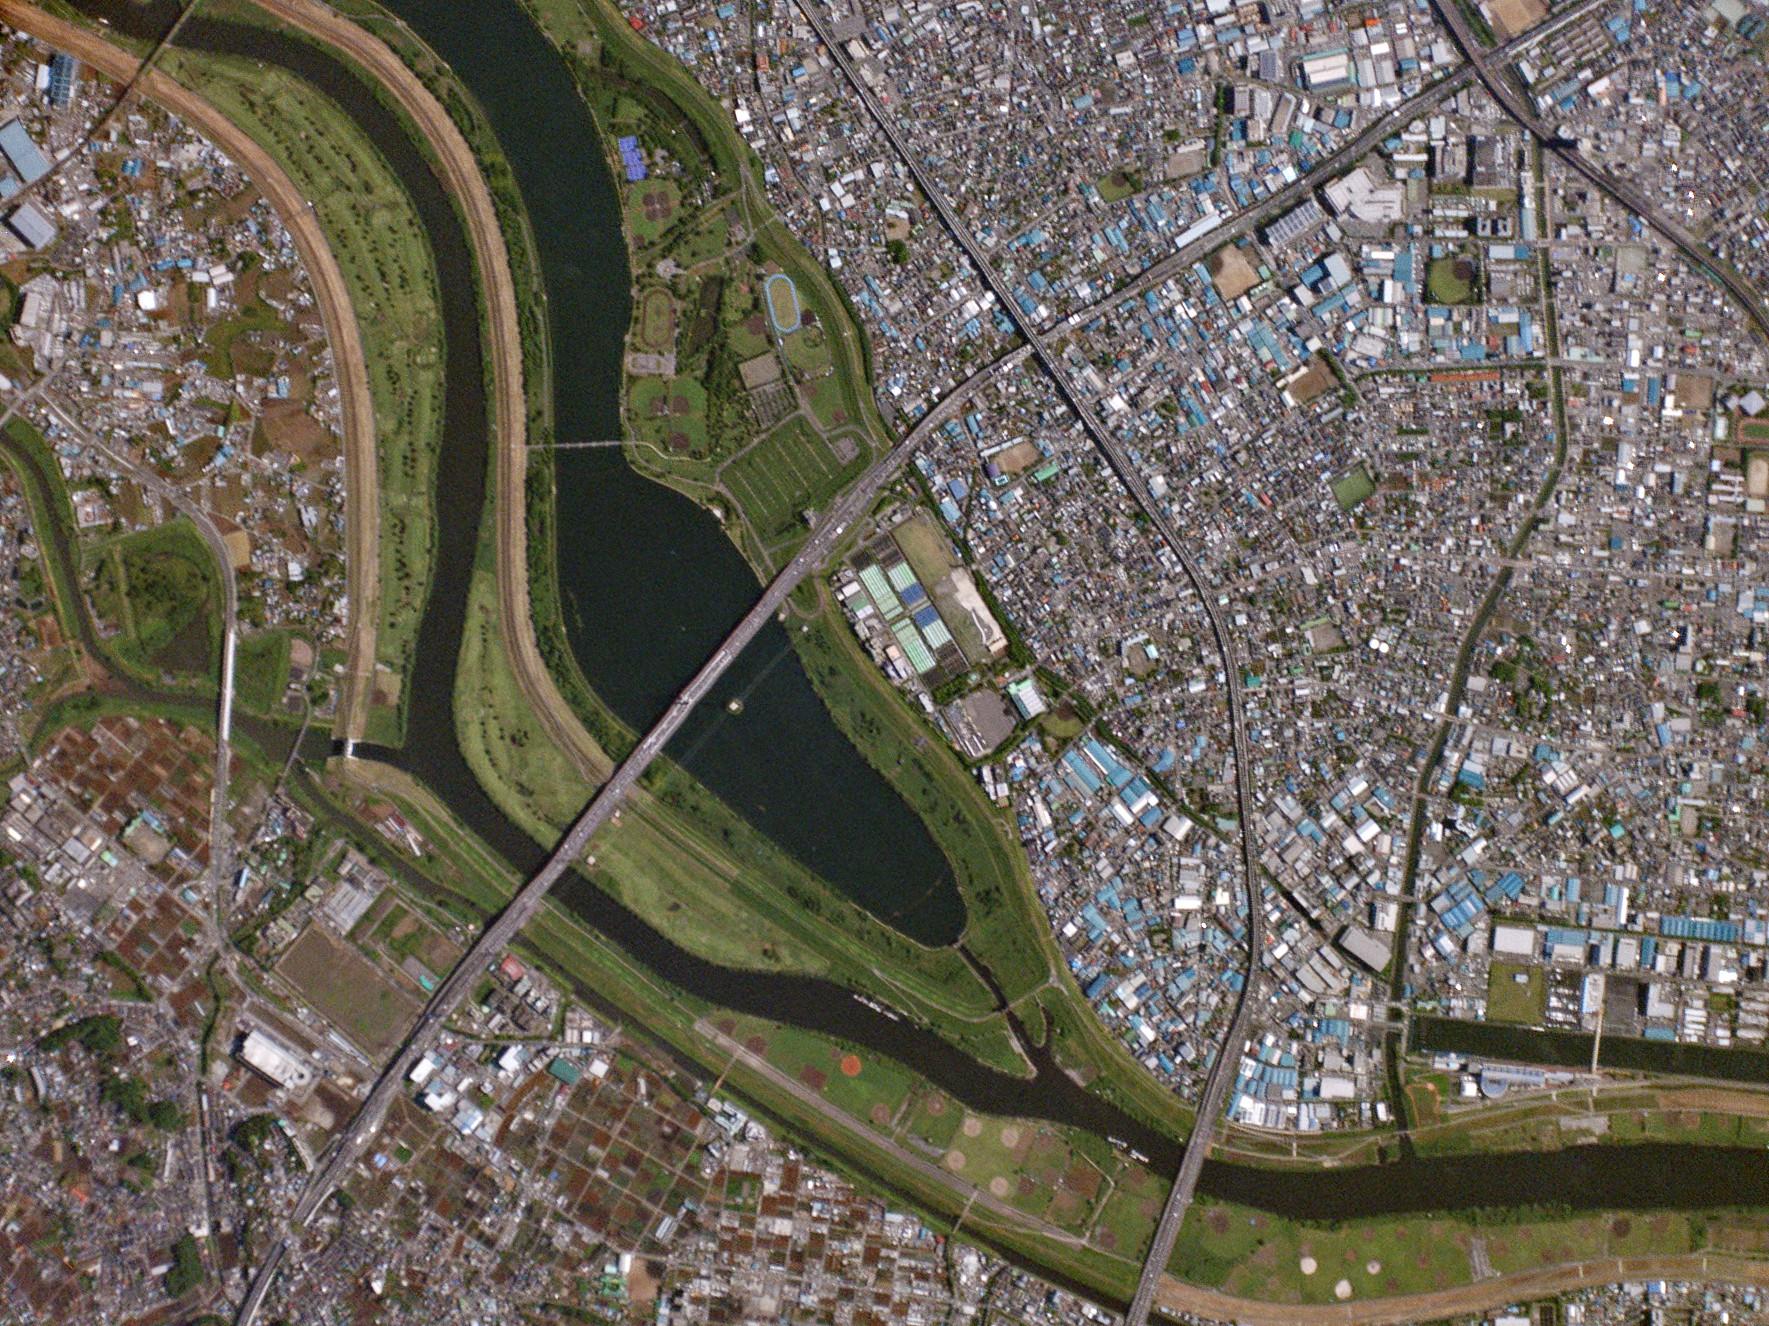 [Arakawa River, Japan]